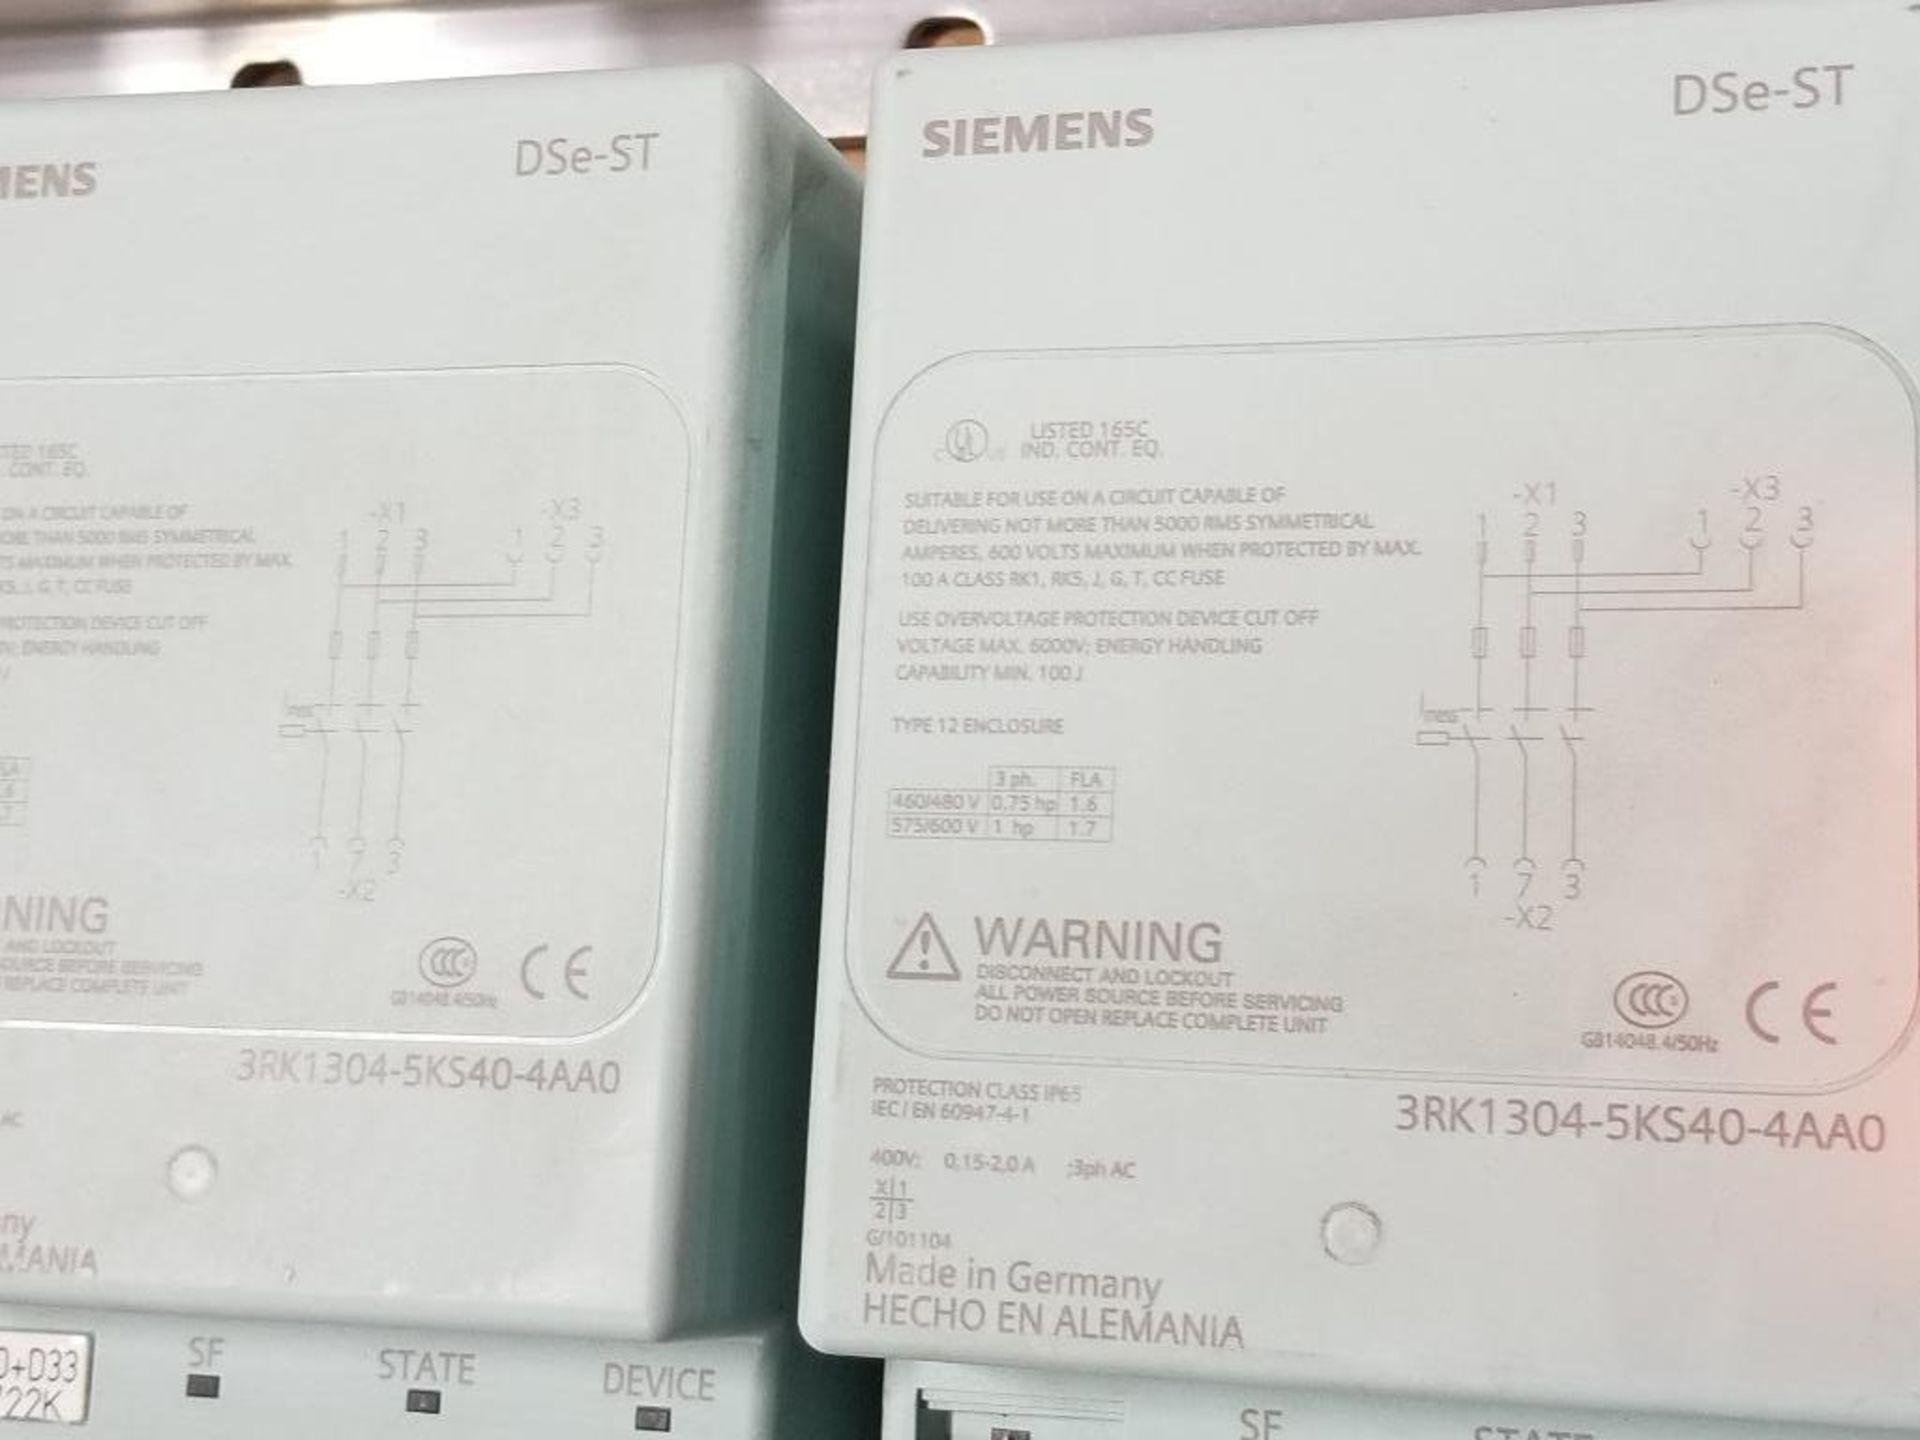 Siemens RSe-ST Reversing starter, DSe-ST Disconnect module flow control line. - Image 2 of 9